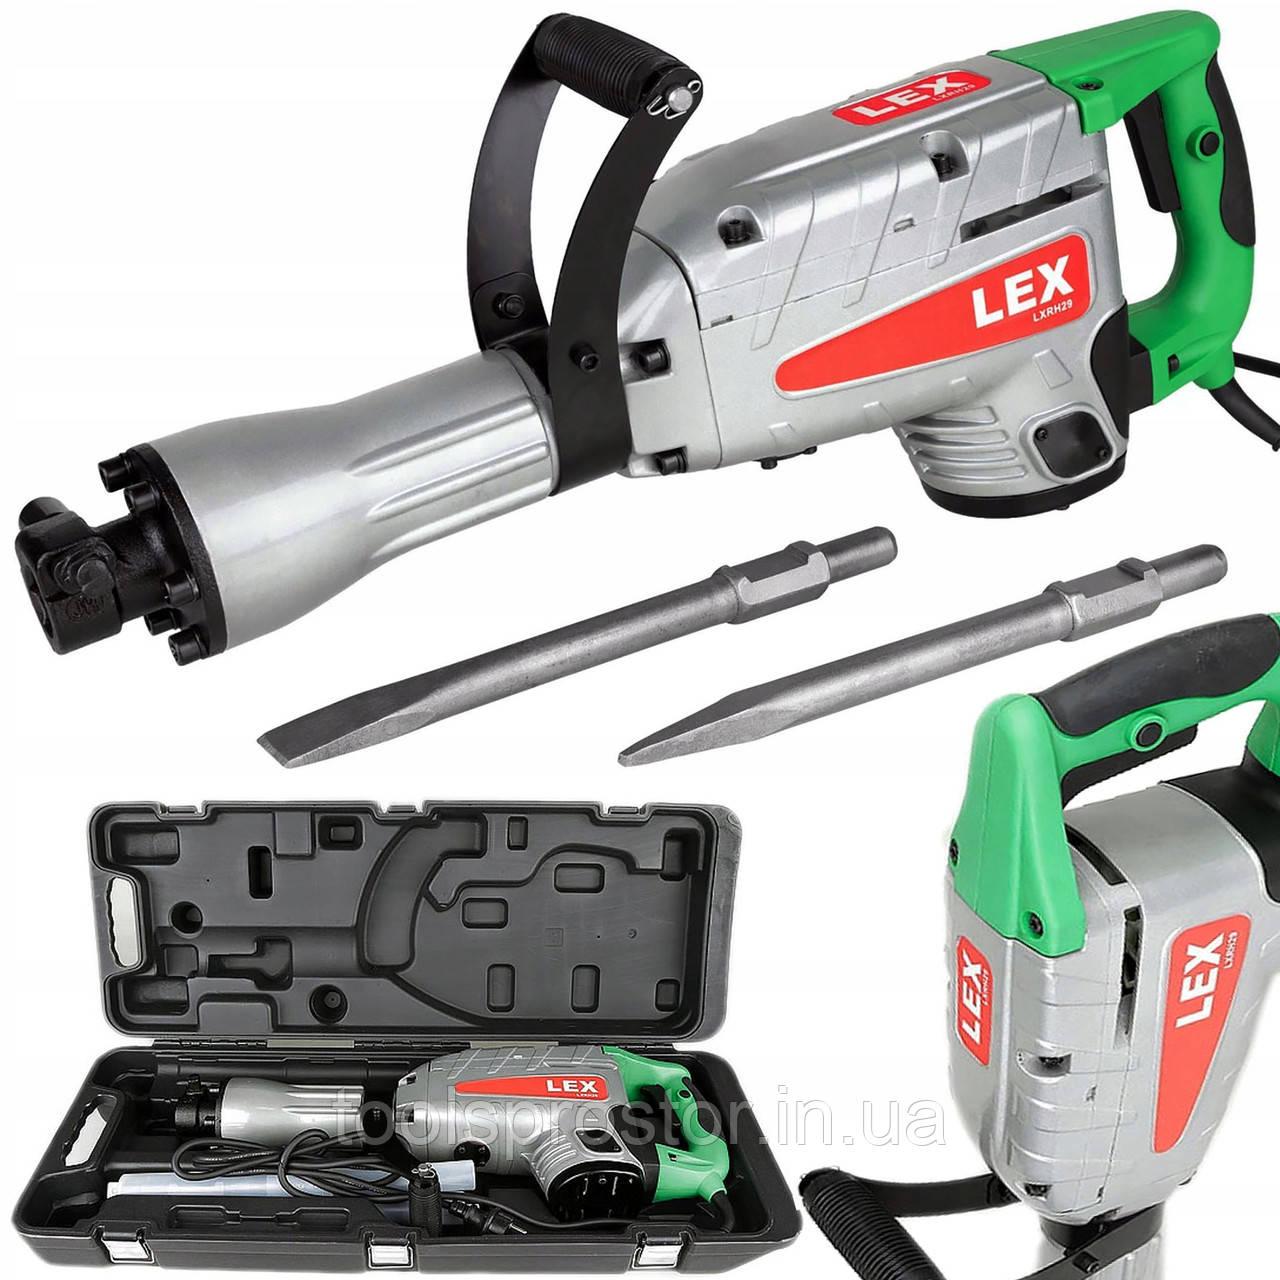 Отбойный молоток LEX LXR29 : 2900 Вт | Удар 55 Дж | Кейс + Зубило, долото в комлекте